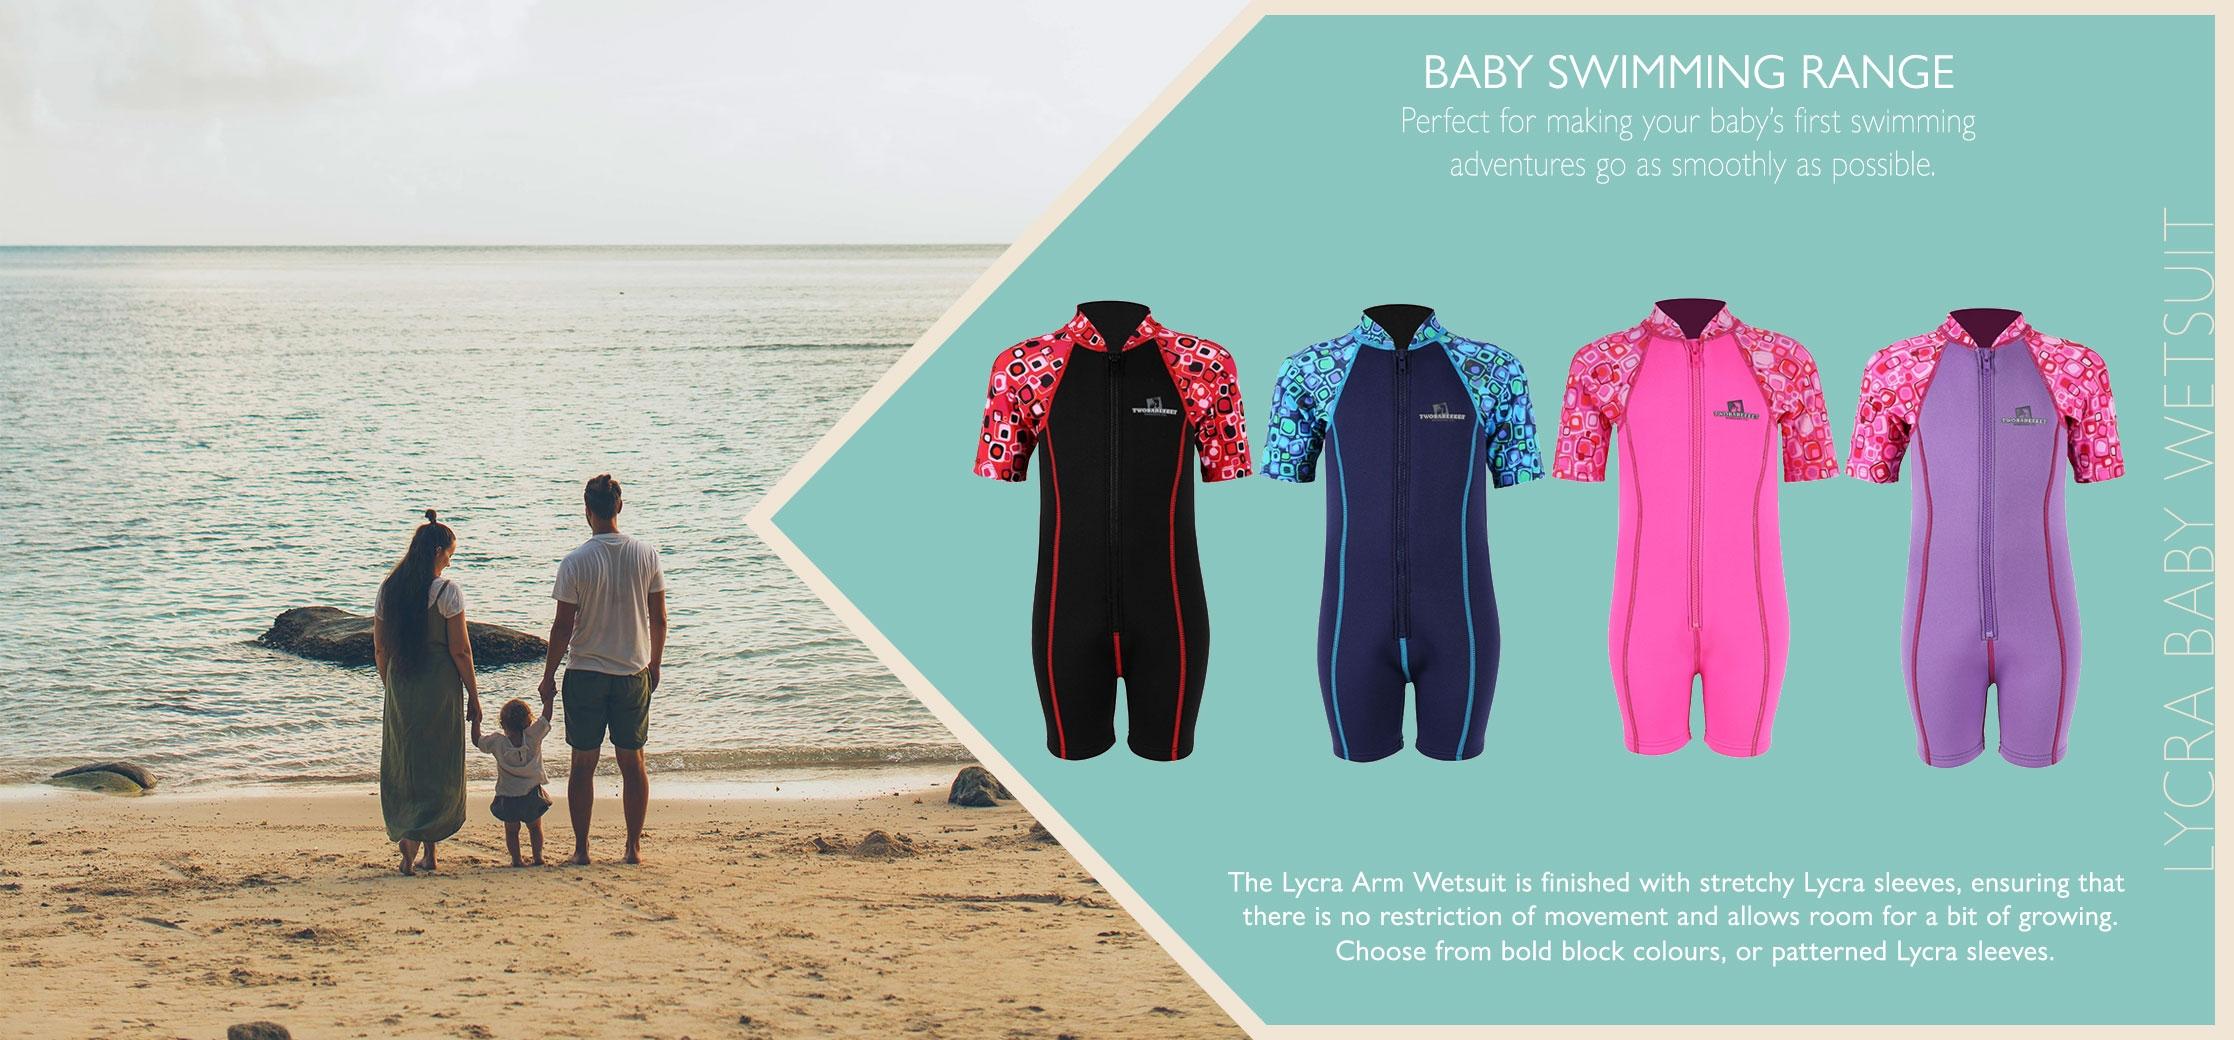 Lycra arm wetsuit info